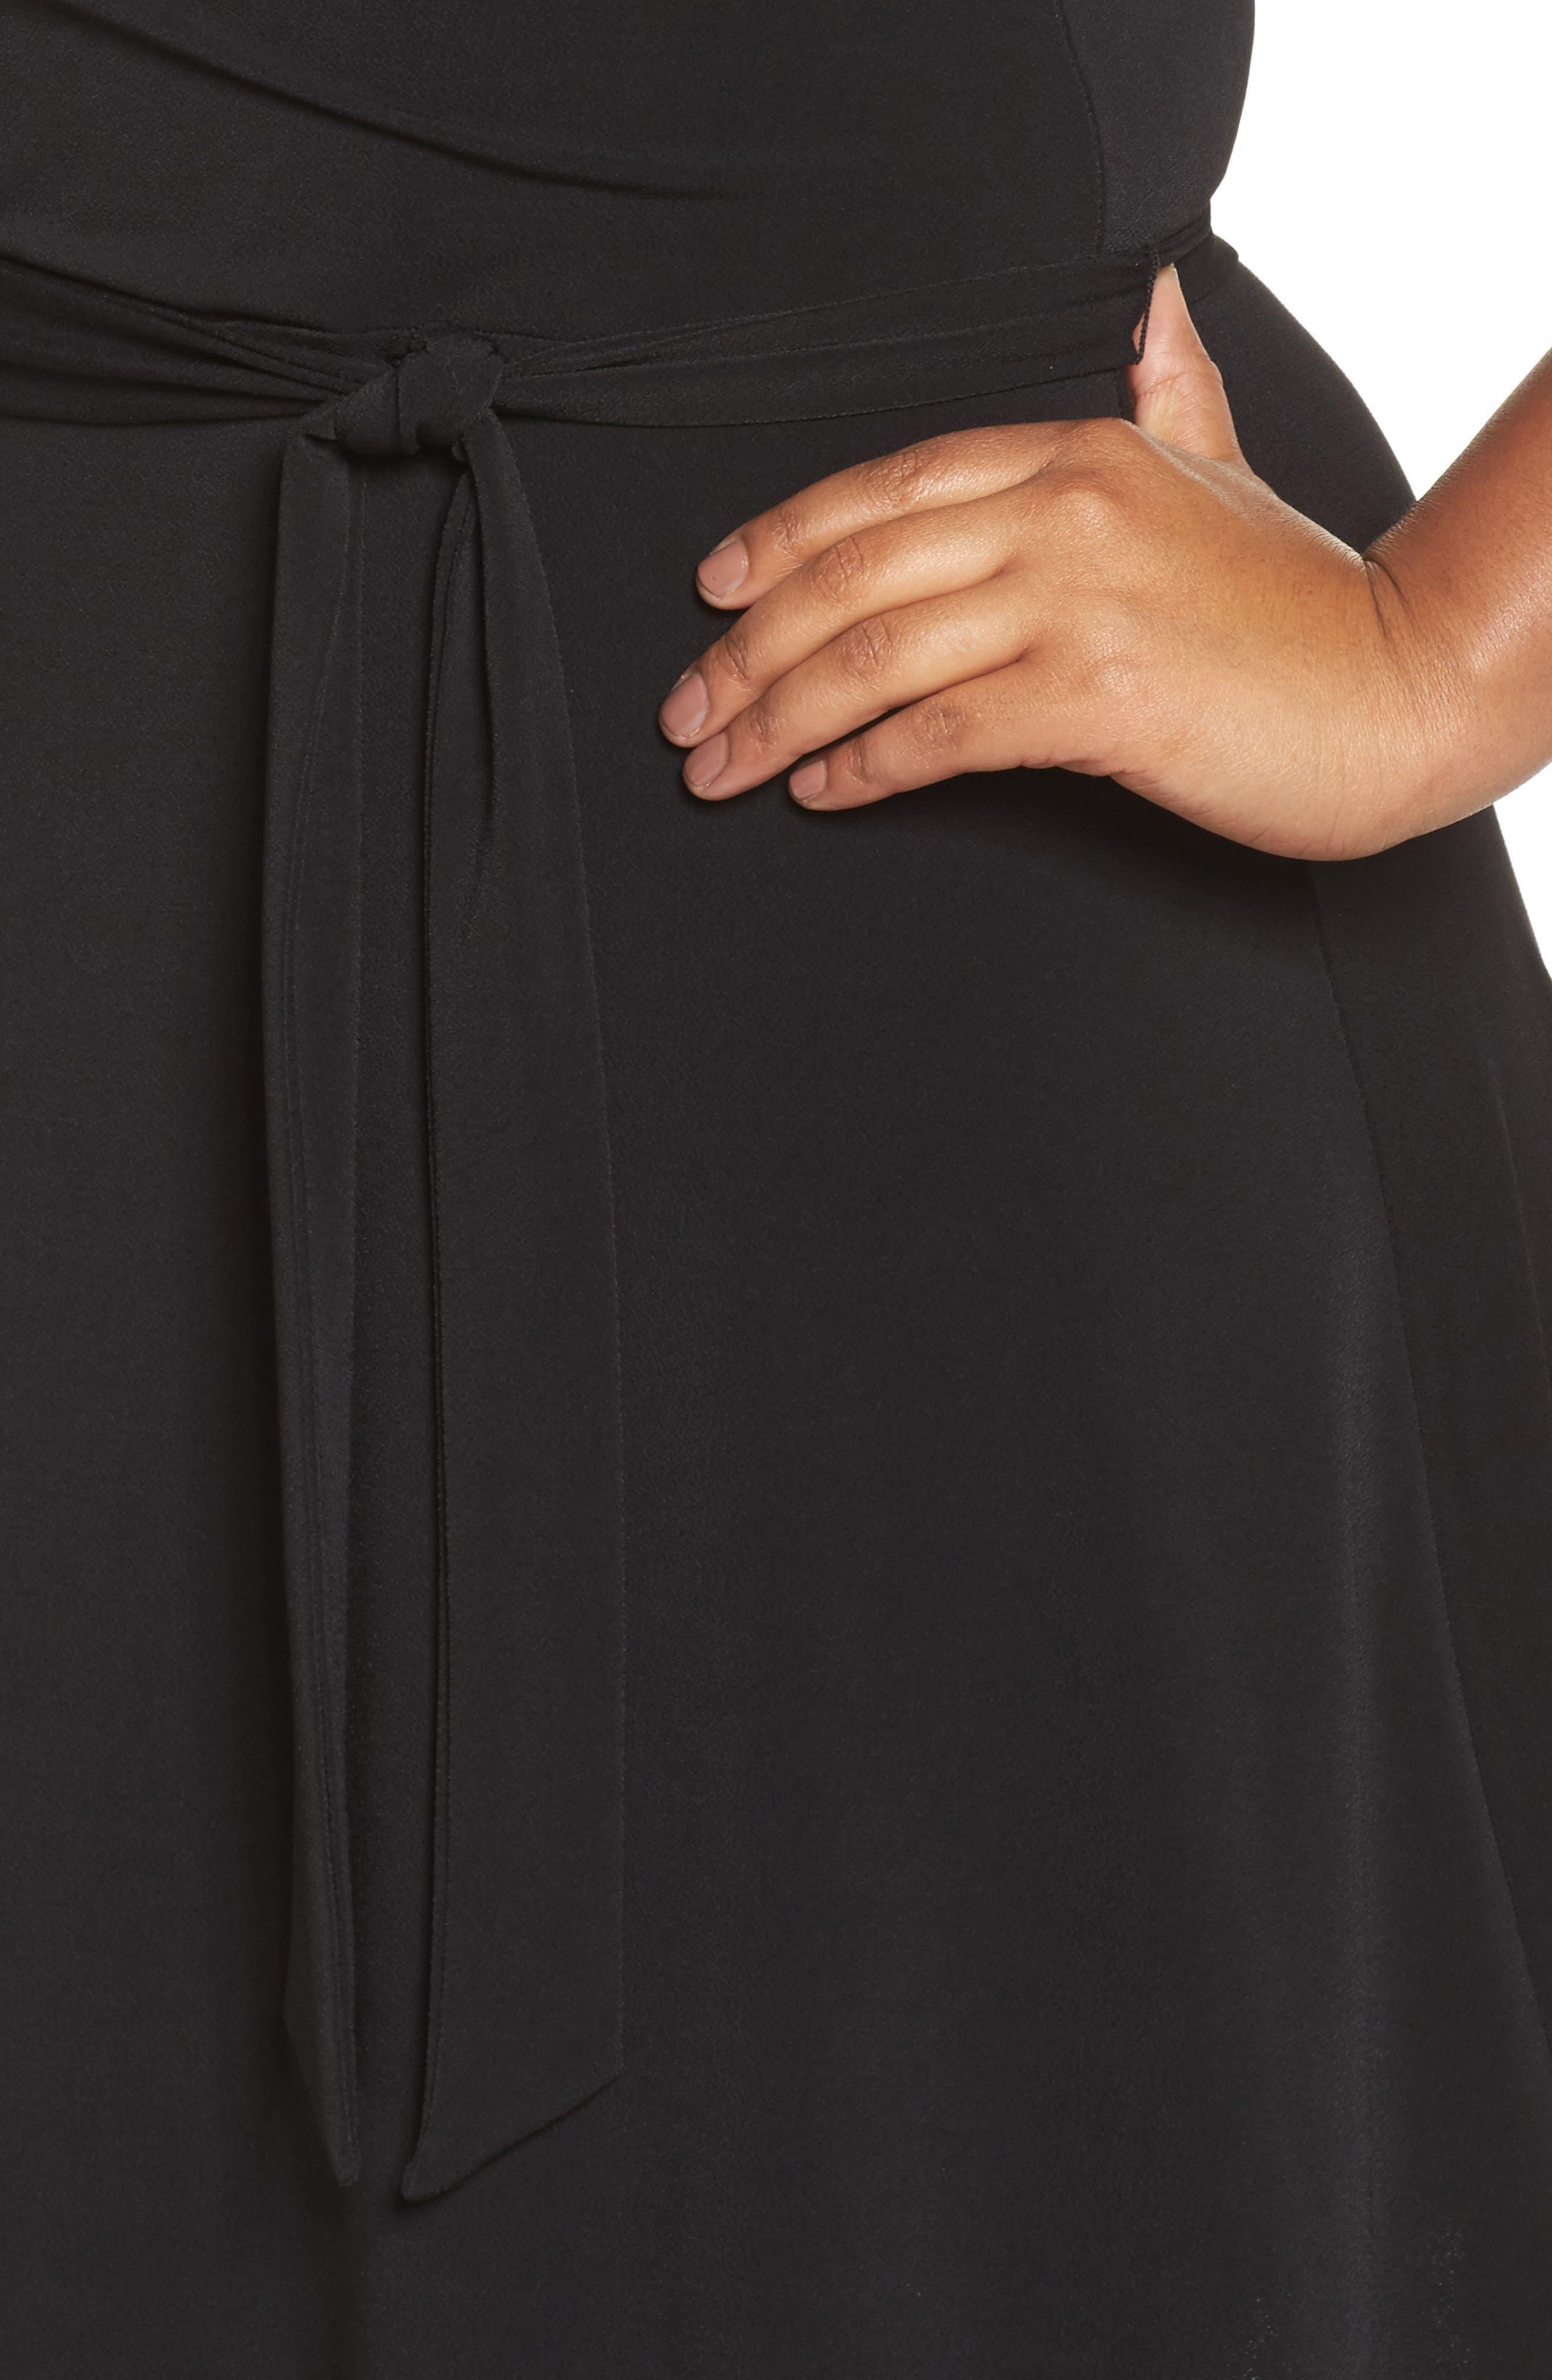 Wrap Dress,                             Alternate thumbnail 4, color,                             Black Crepe